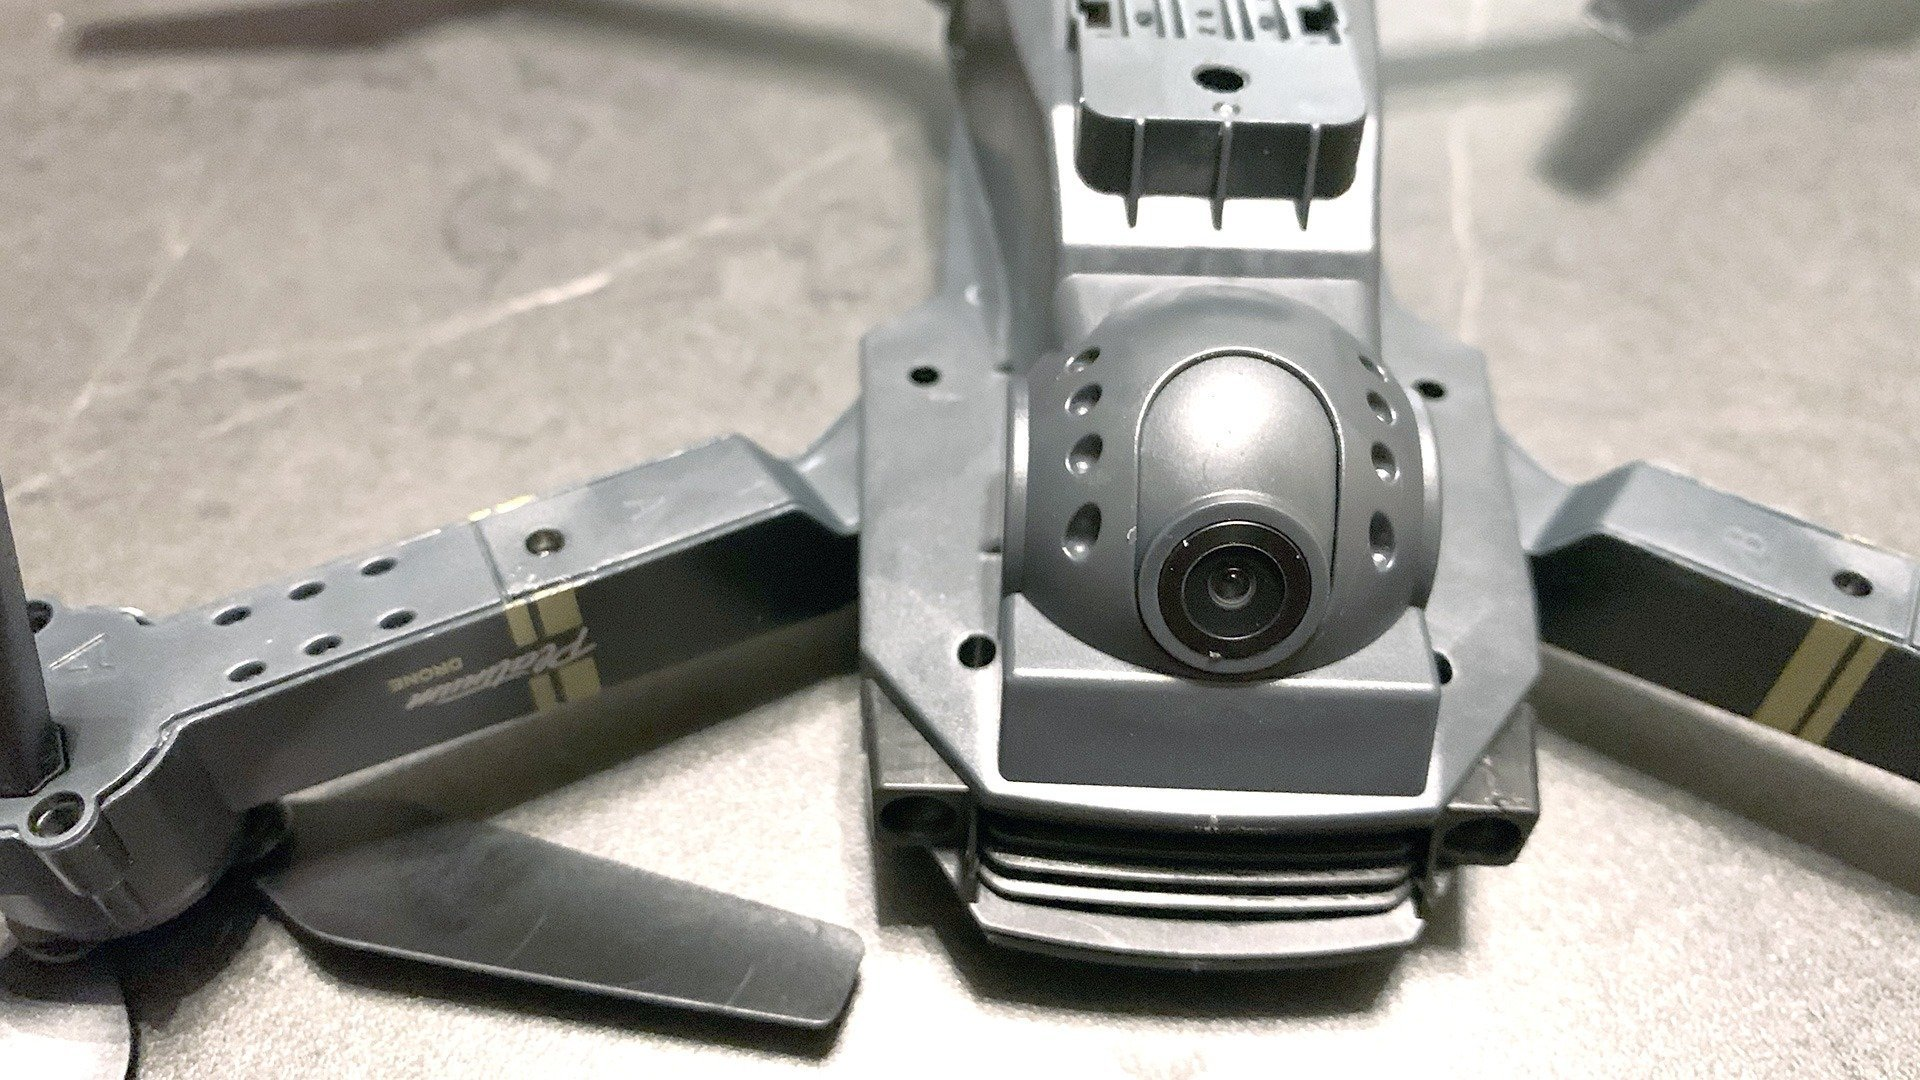 DroneX Pro Gimbal? Nein, da ist kein Gimbal bei der DroneX Pro